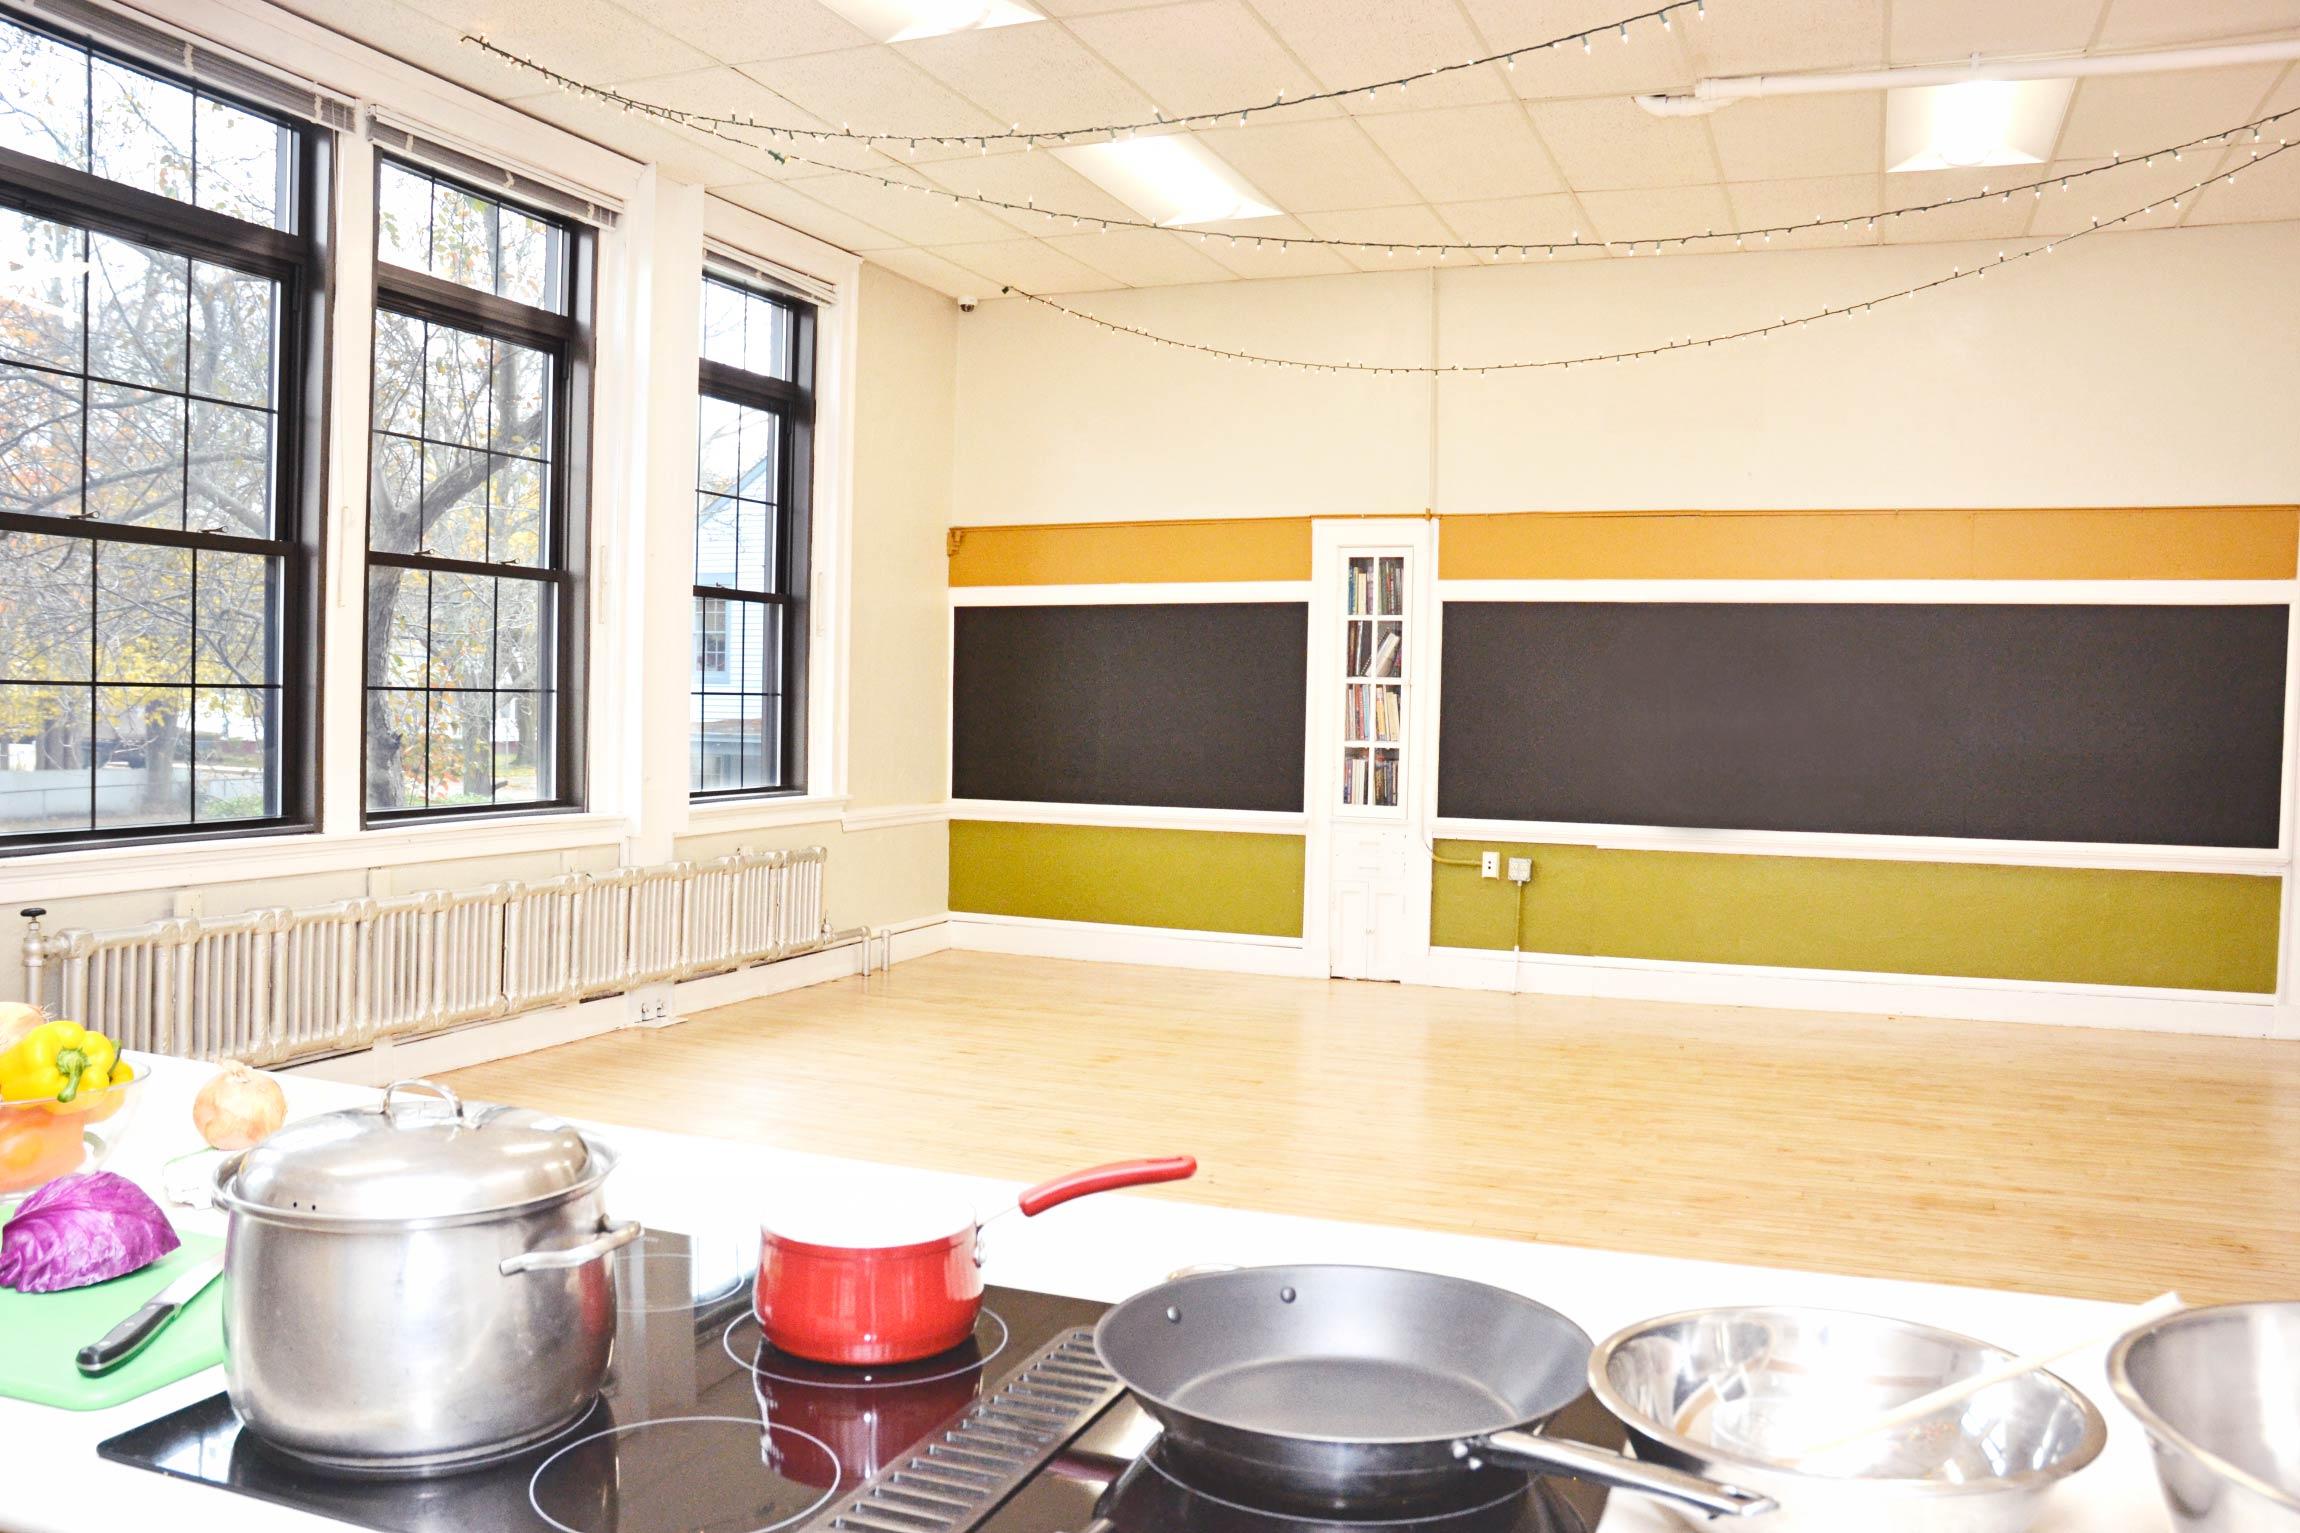 Demo Kitchen Cooking Classroom At Hope Main Hope Main